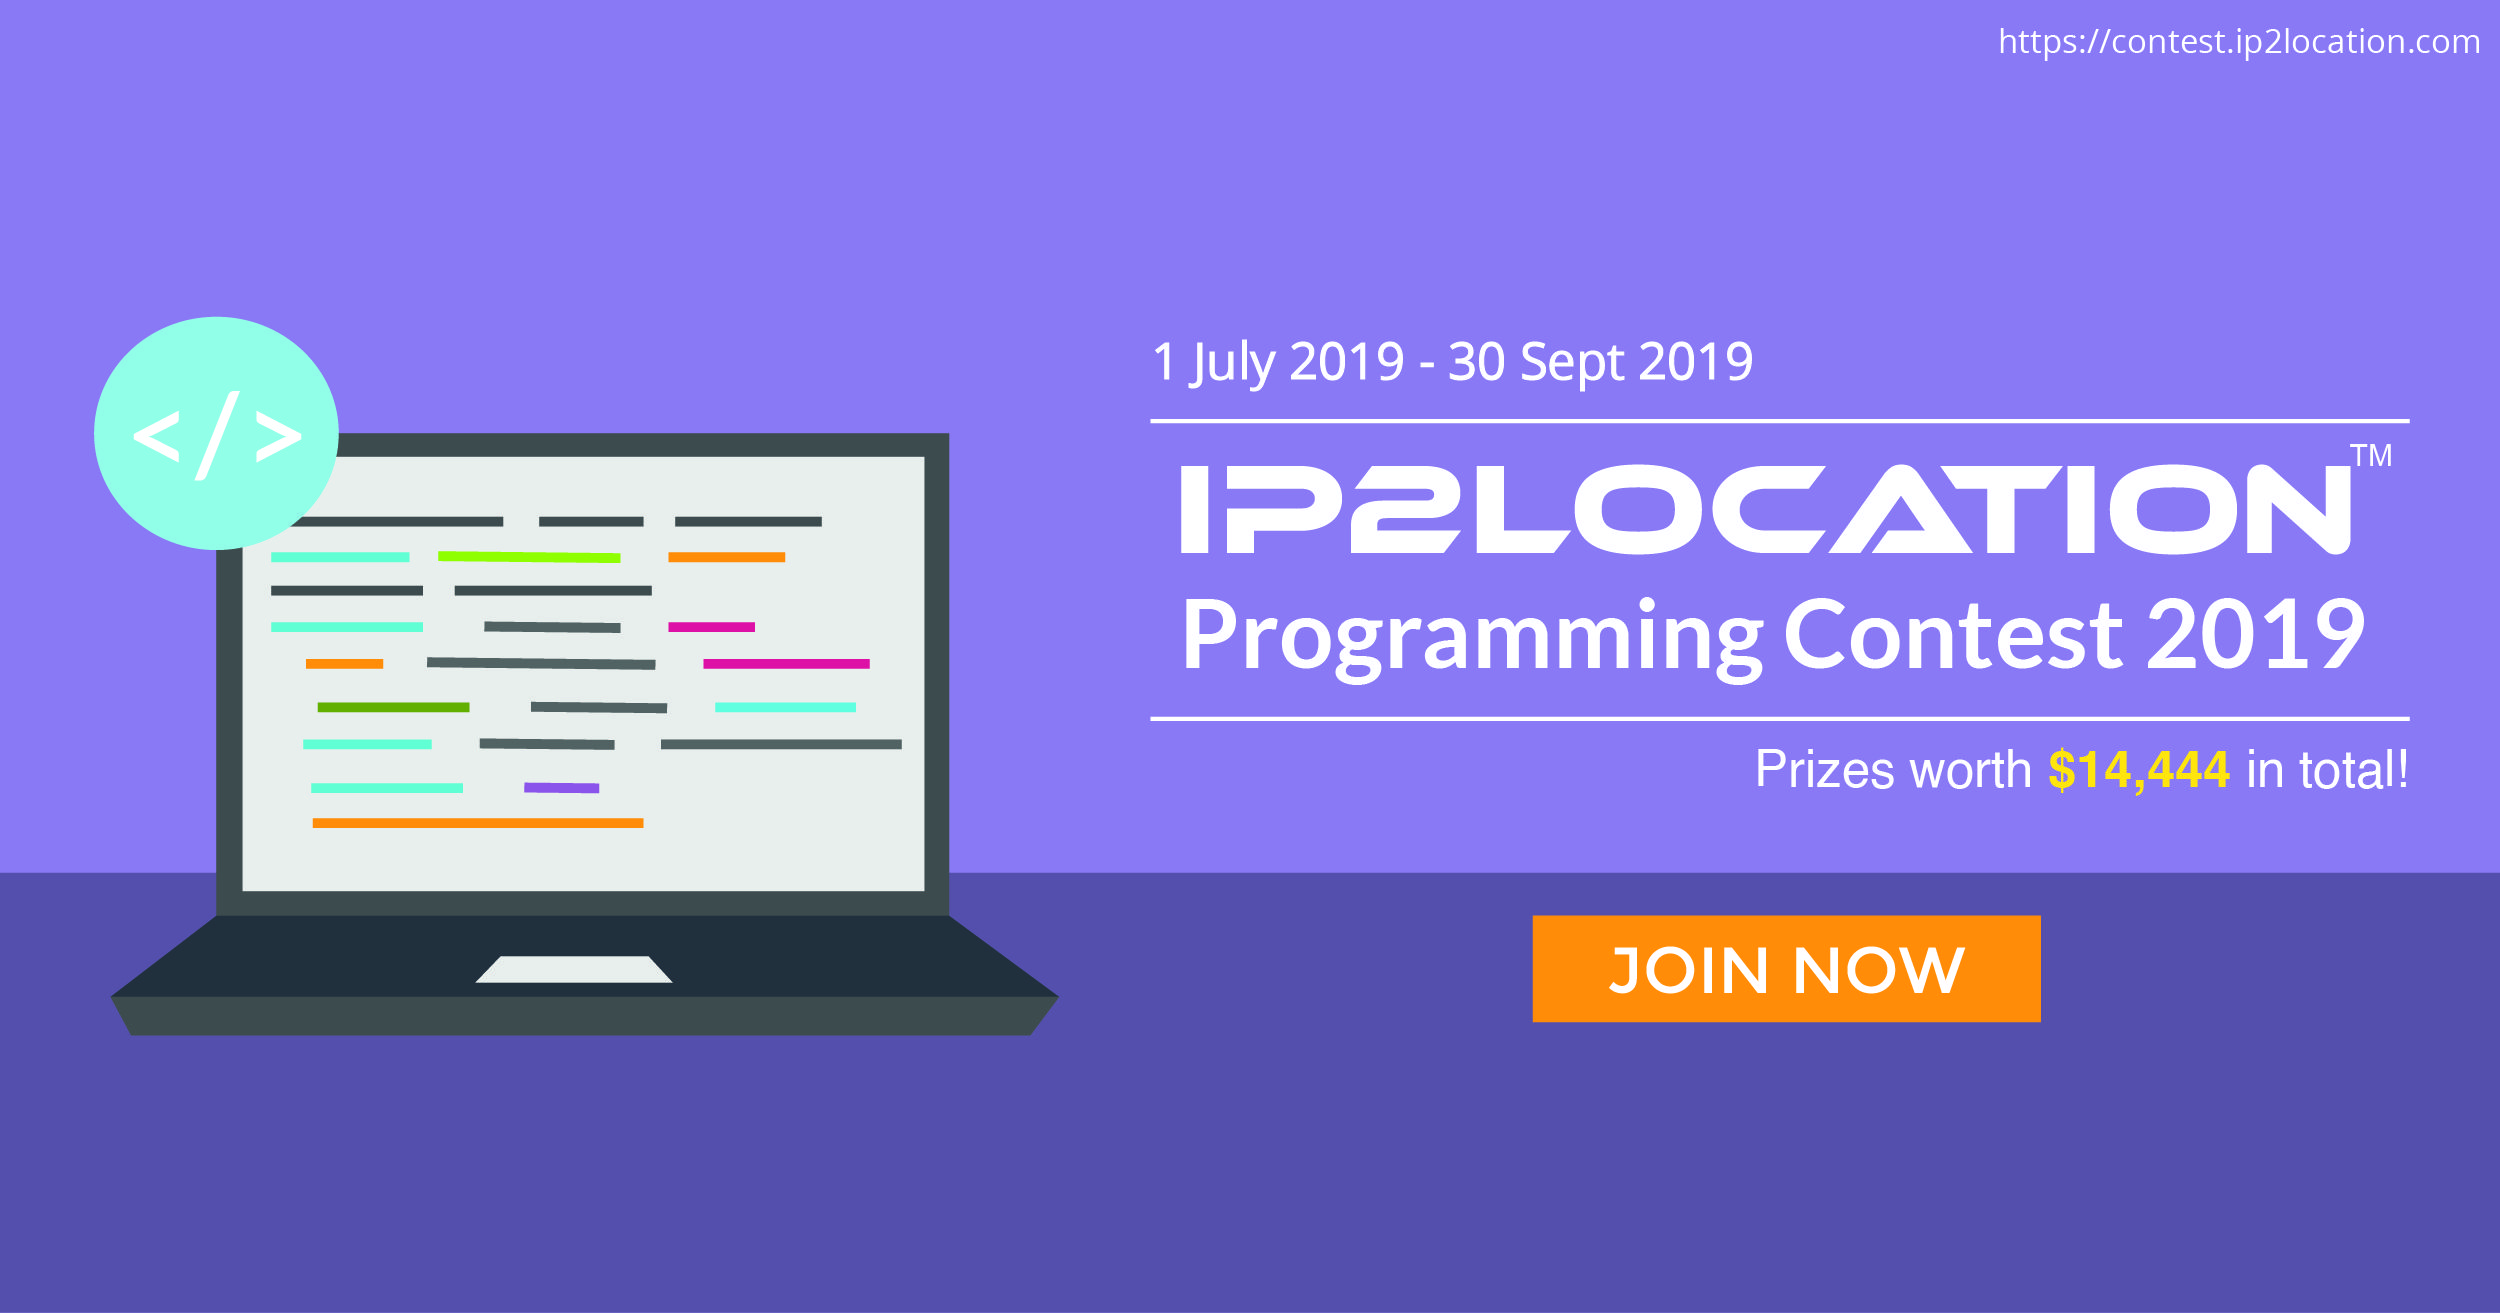 IP2Location Programming Contest 2019 Contest, City